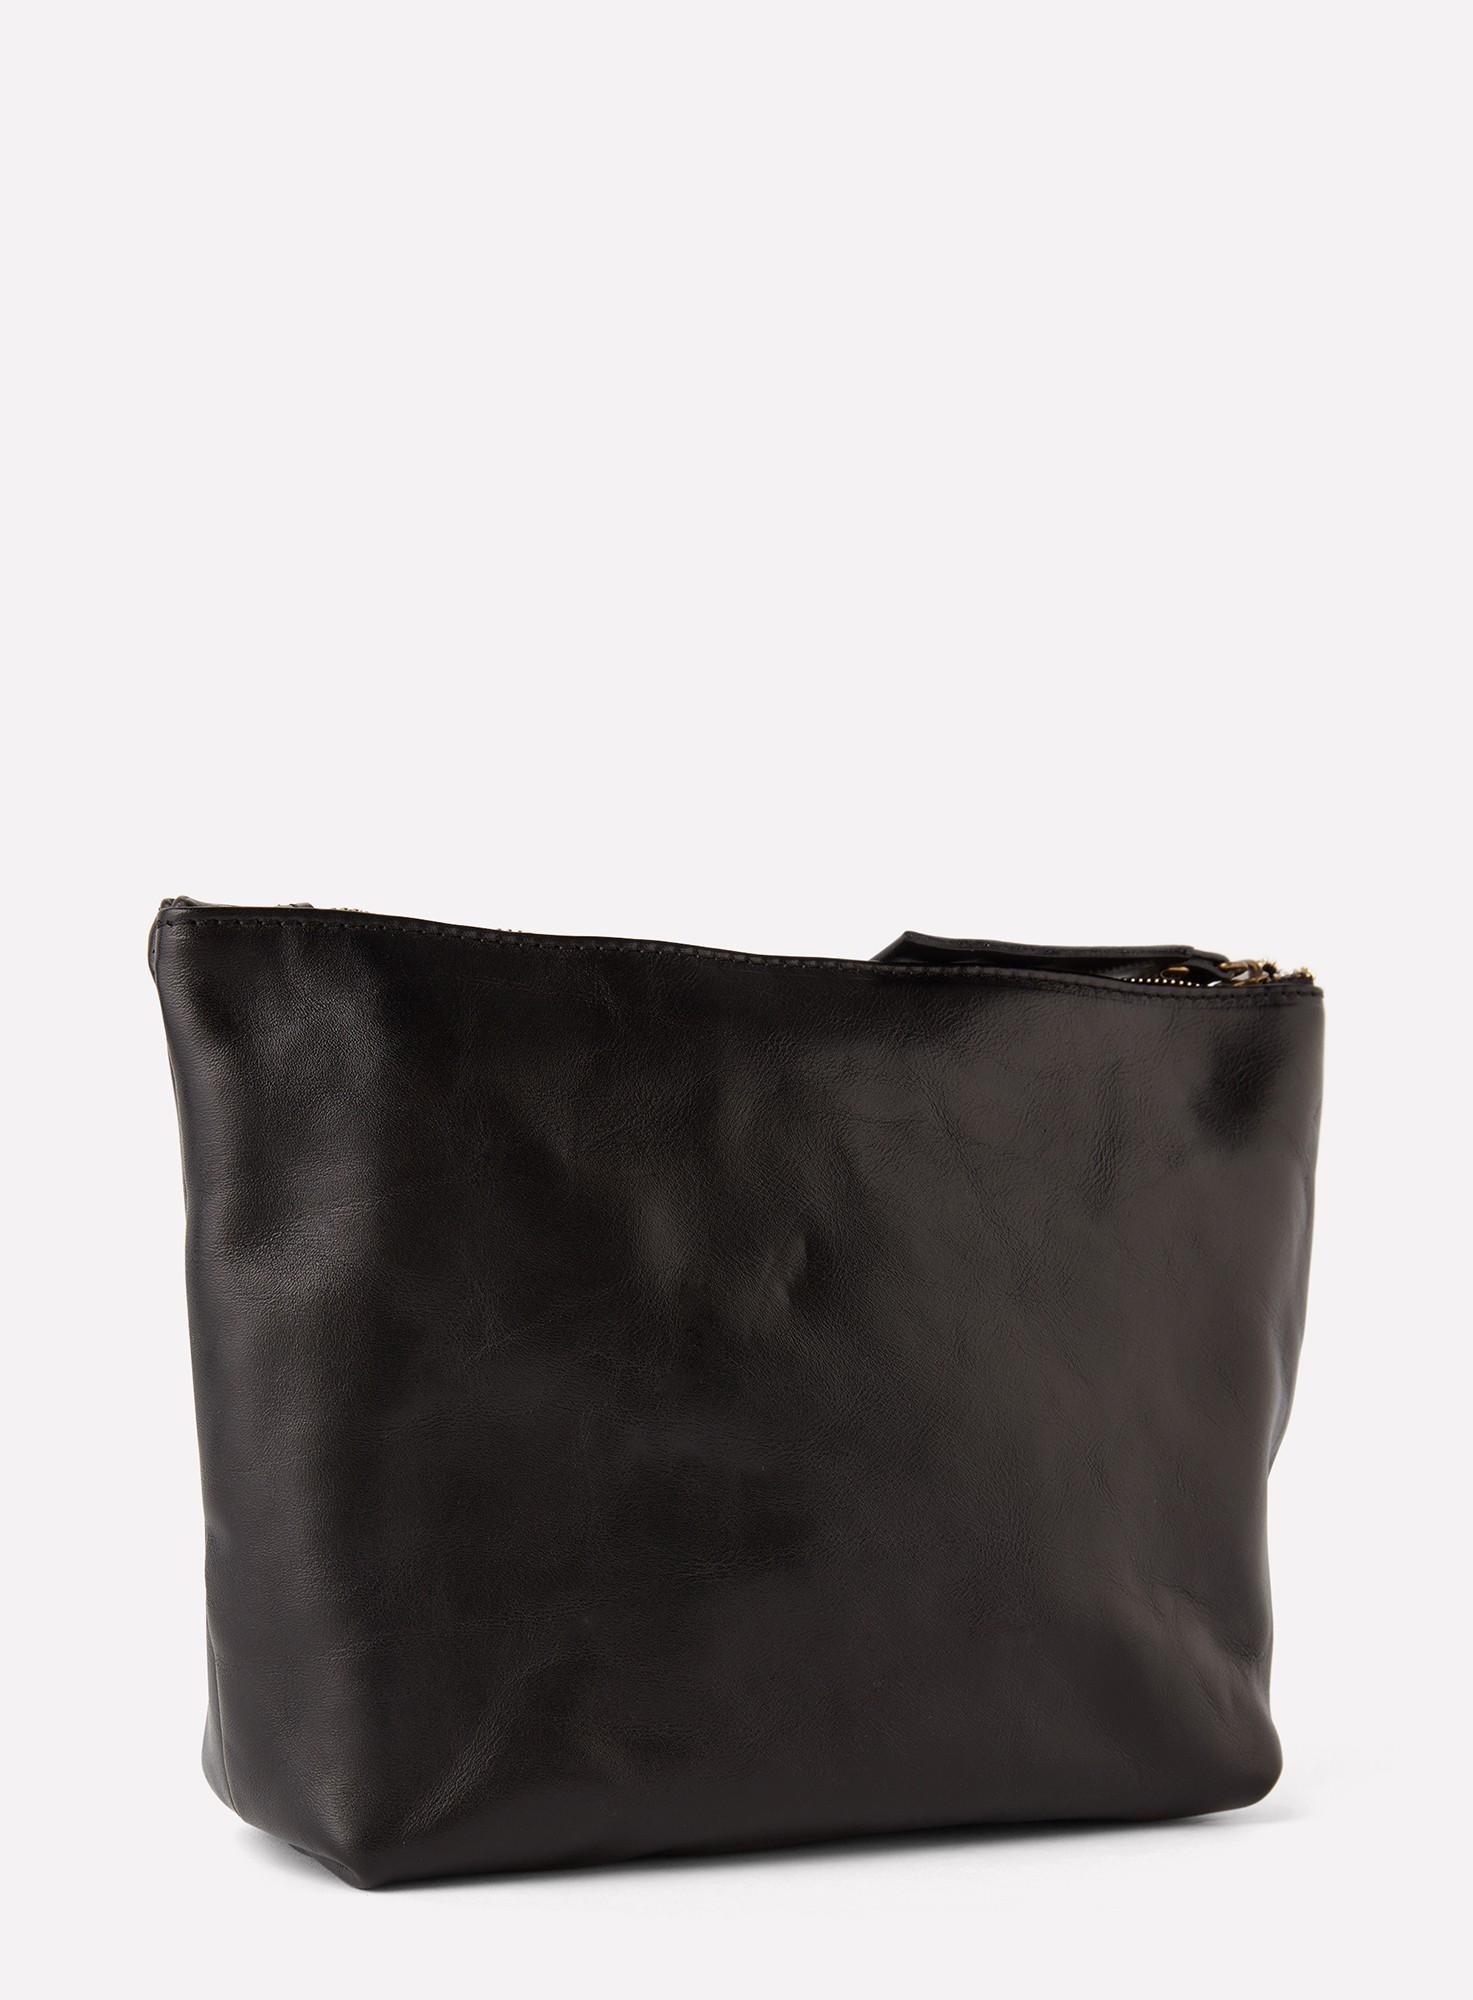 SPONGE BAG | YUMA